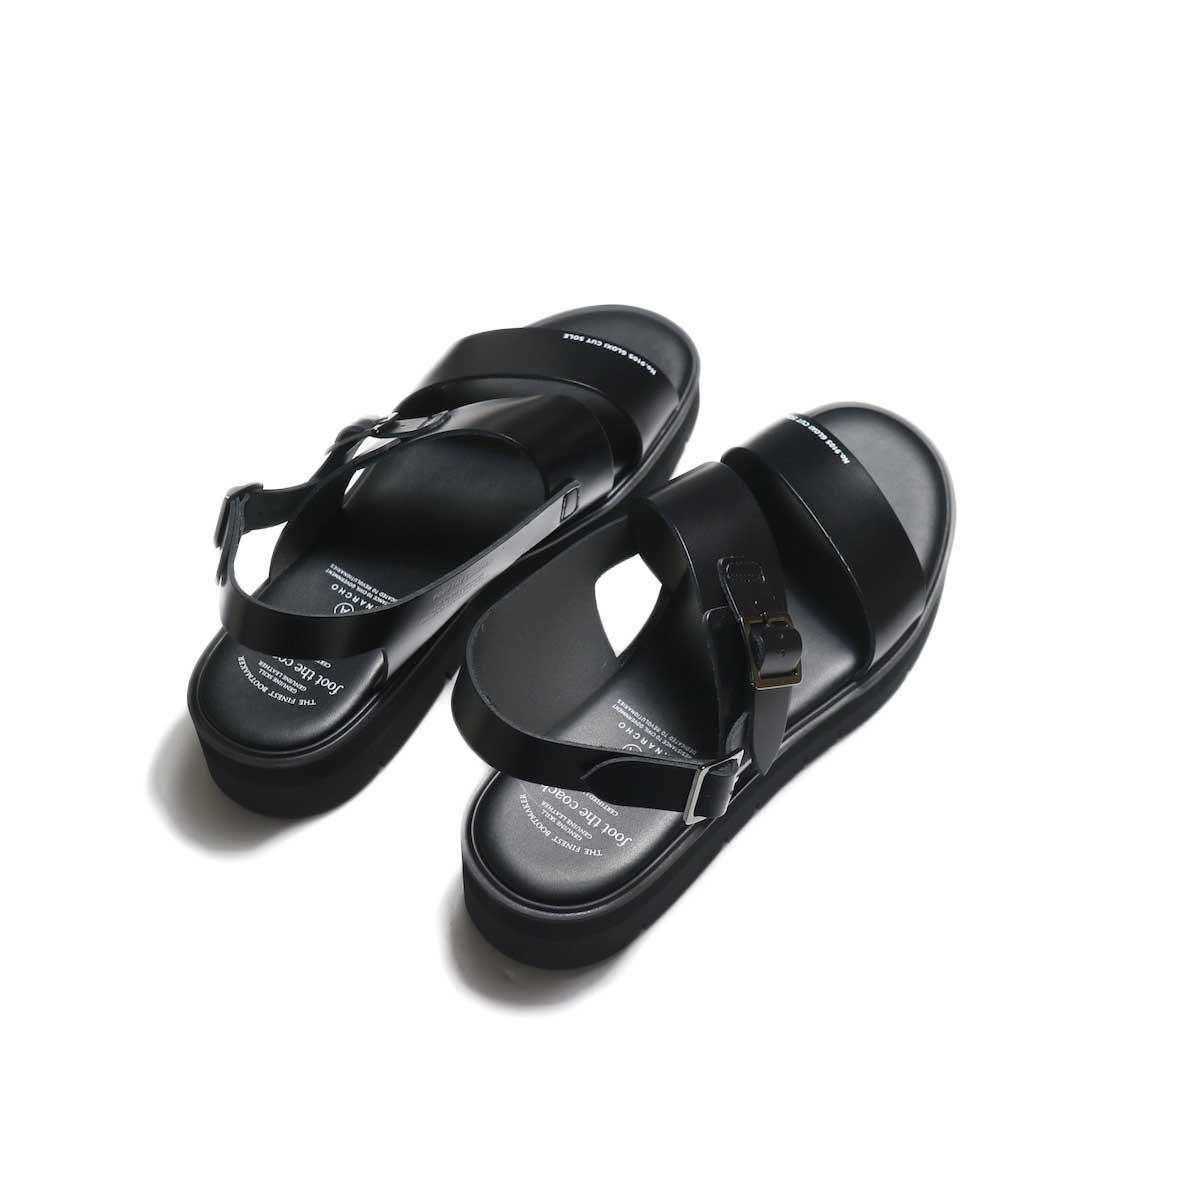 foot the coacher / SS BELT SANDALS (GLOXI CUT SOLE) -Black 背面